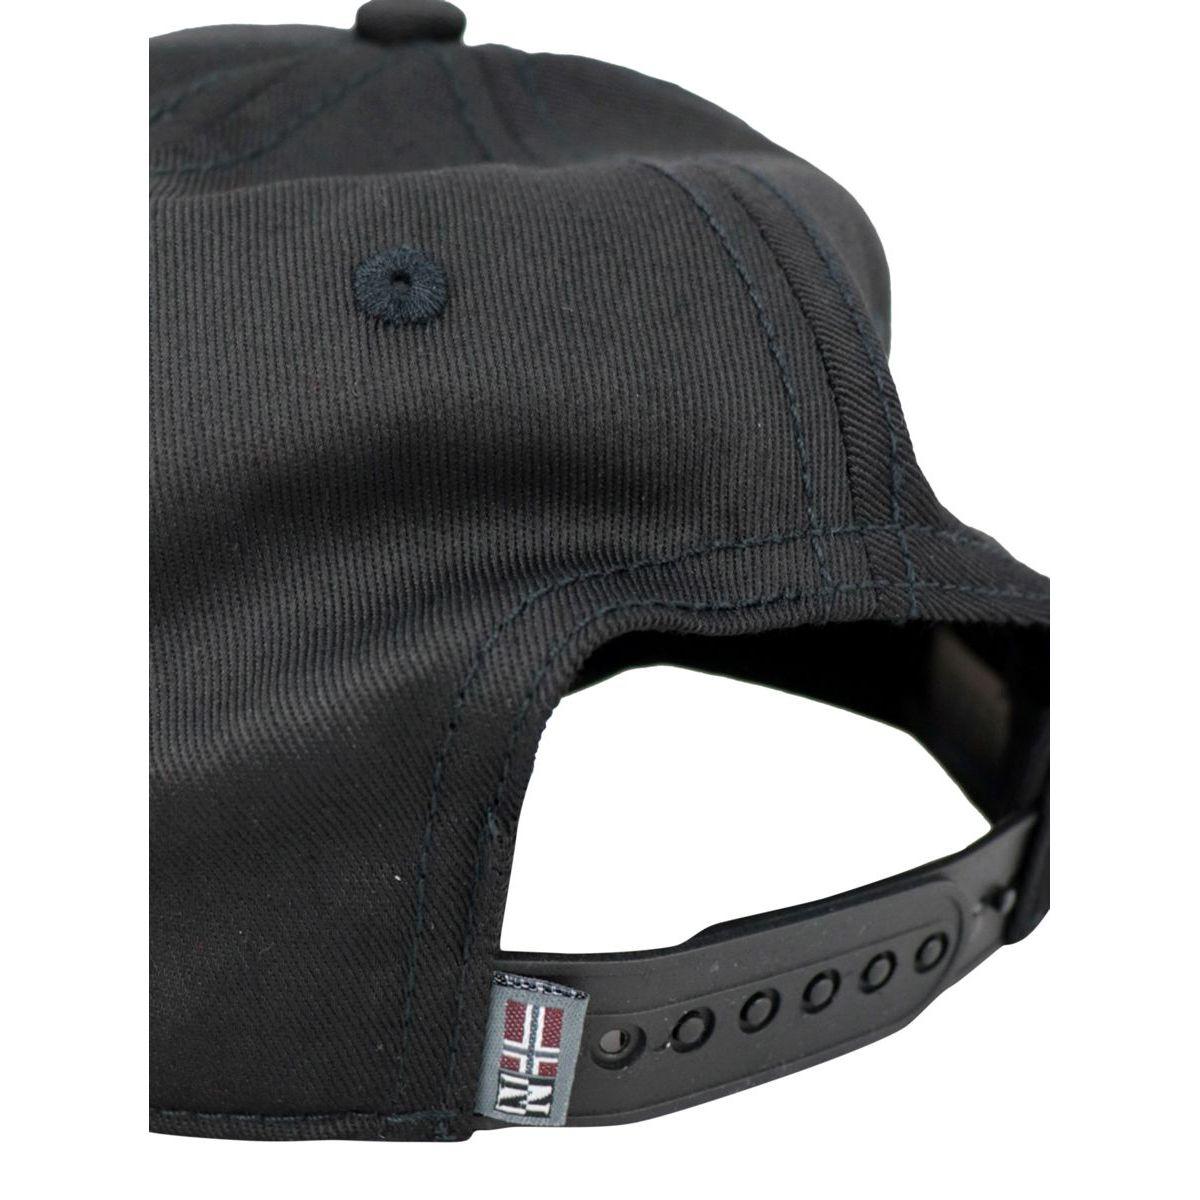 Cotton blend visor hat with printed logo Black NAPAPIJRI